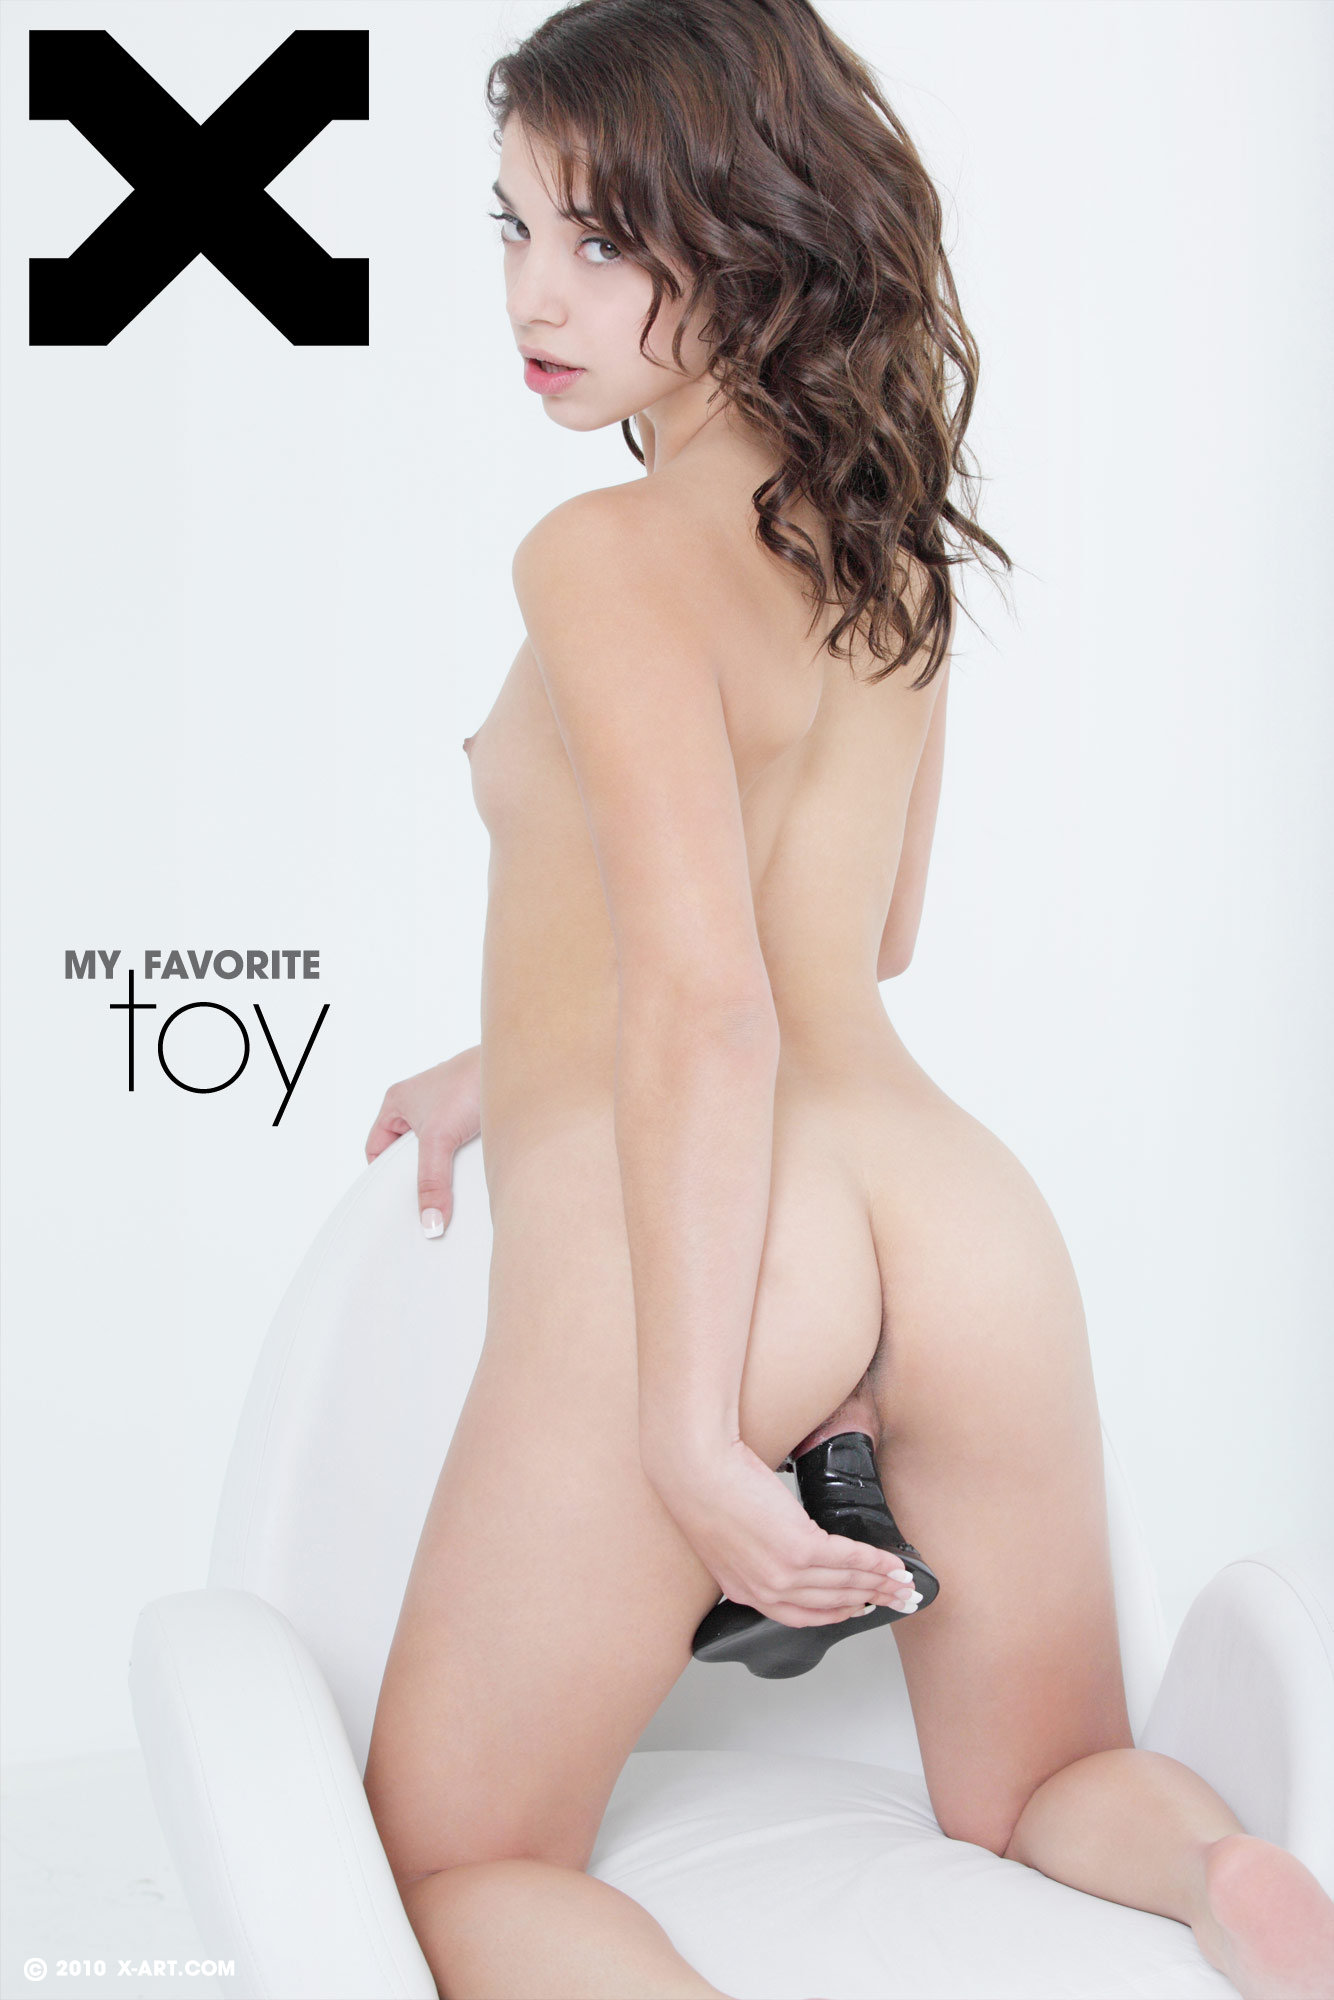 turboimagehost.com imagesize:960x1440bd porn r x art gigi r my favorite toy 01 lrg